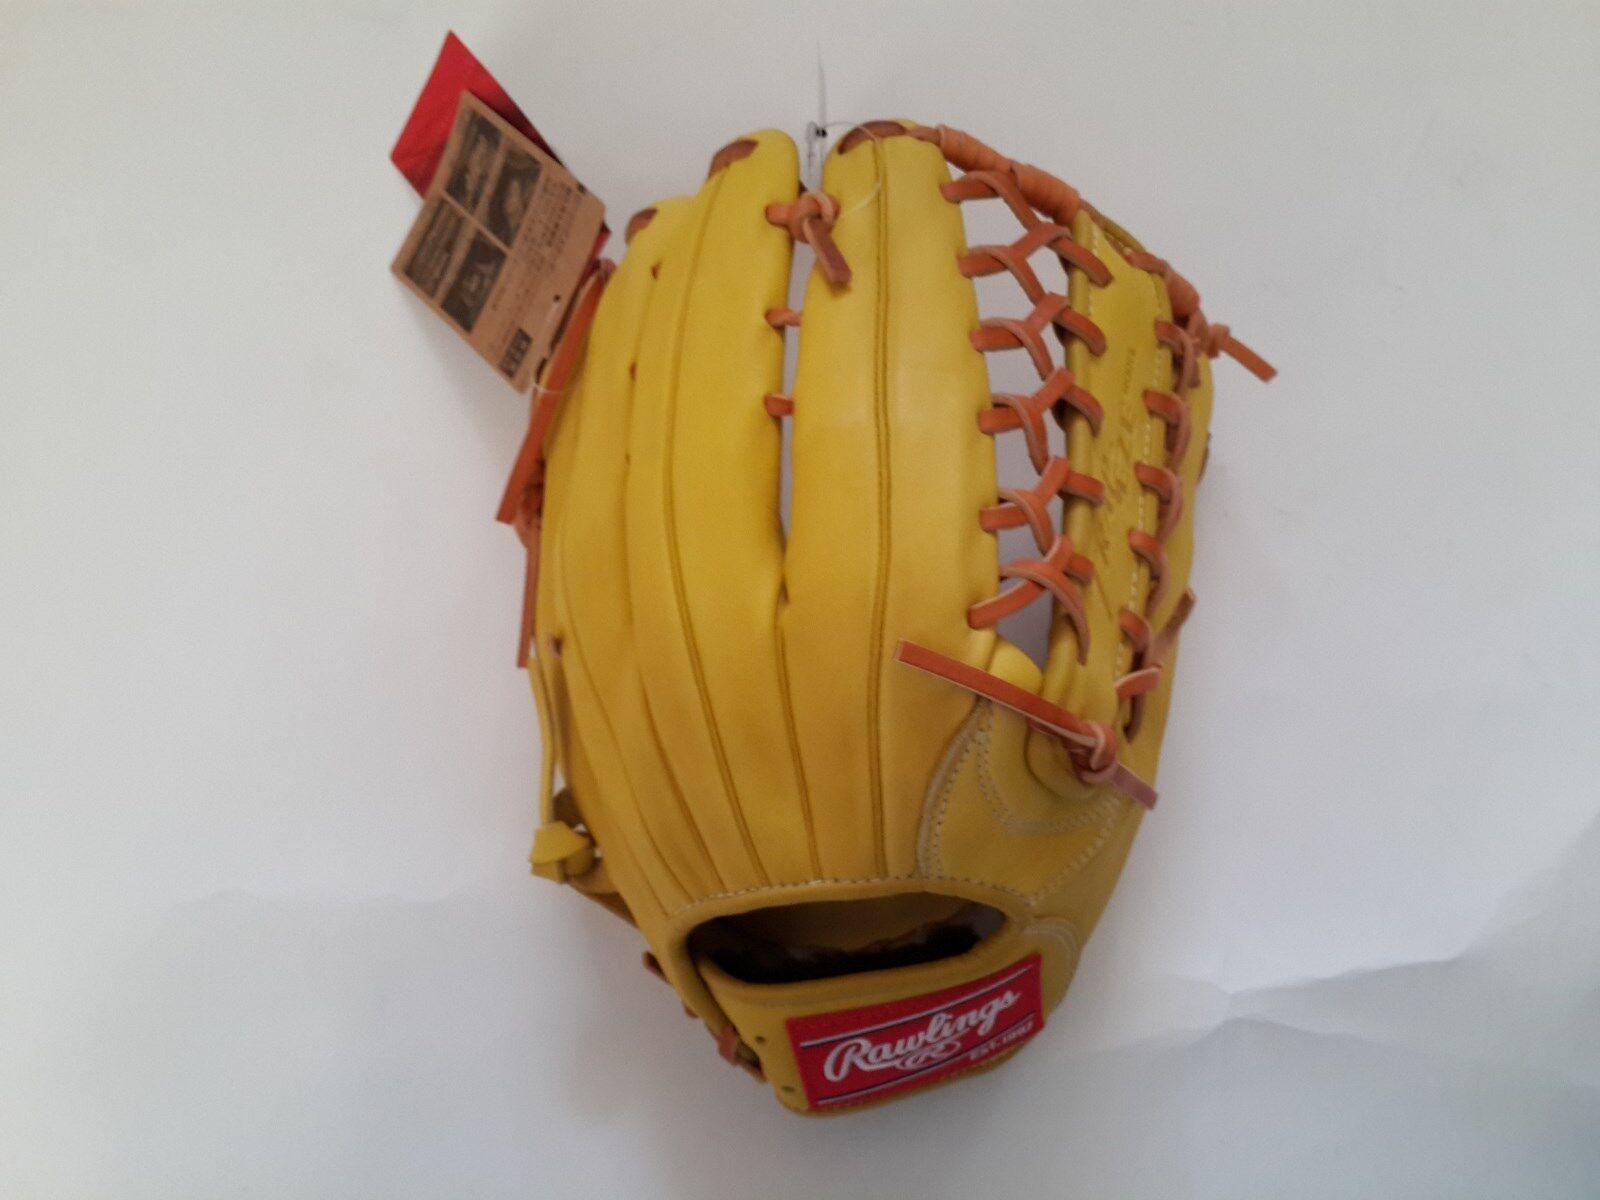 Rawlings Gamer Outfielders Baseball Glove TRAP-EZE GR5G8 12.5